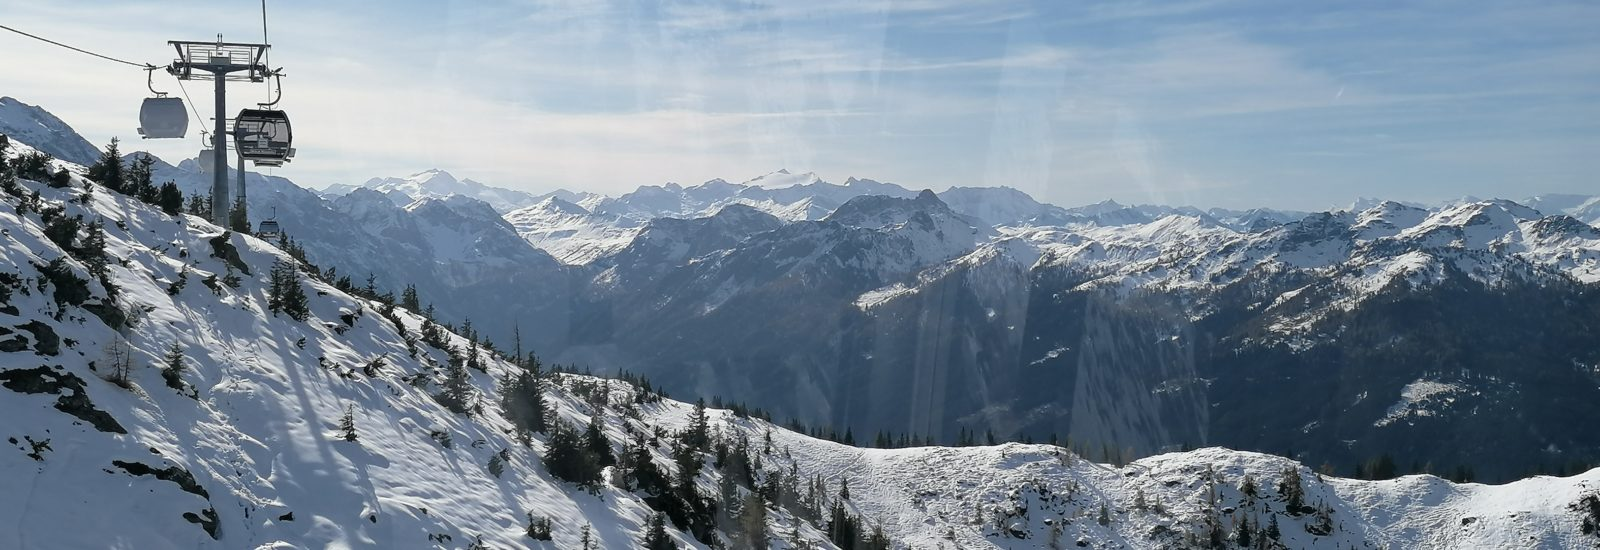 Panorama Link in Wagrain-Kleinarl